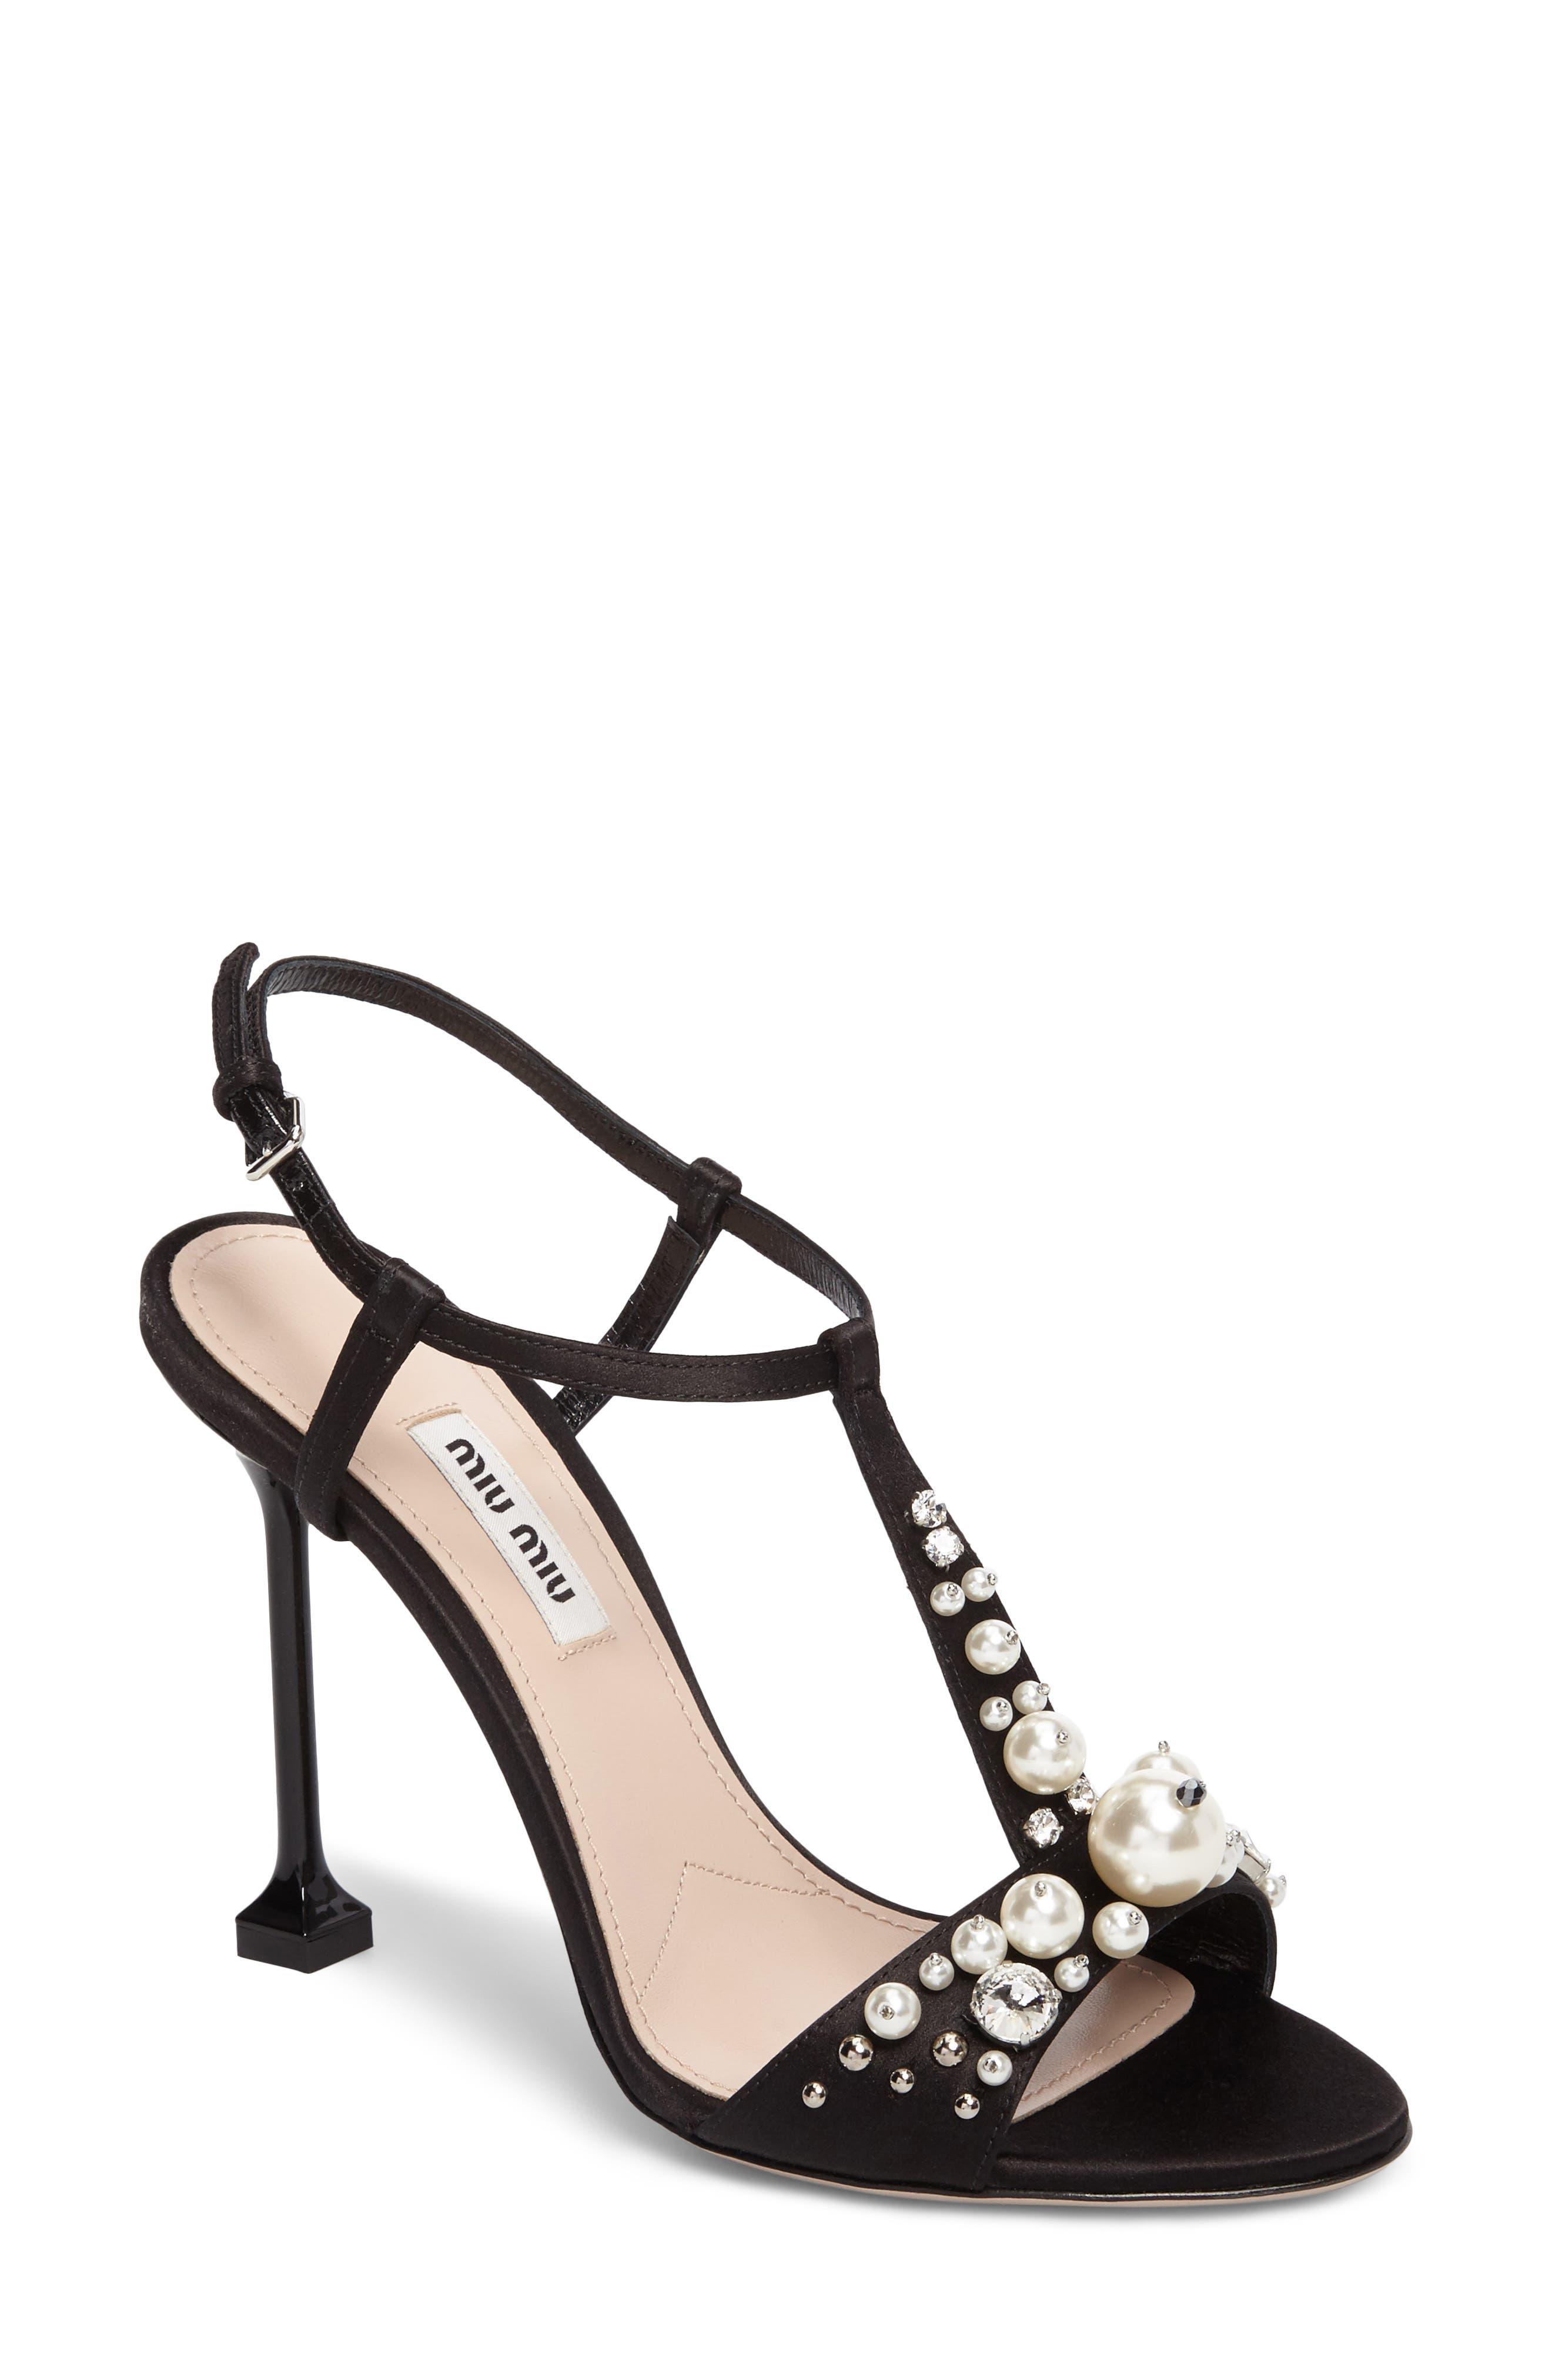 Embellished T-Strap Sandal,                             Main thumbnail 1, color,                             Black